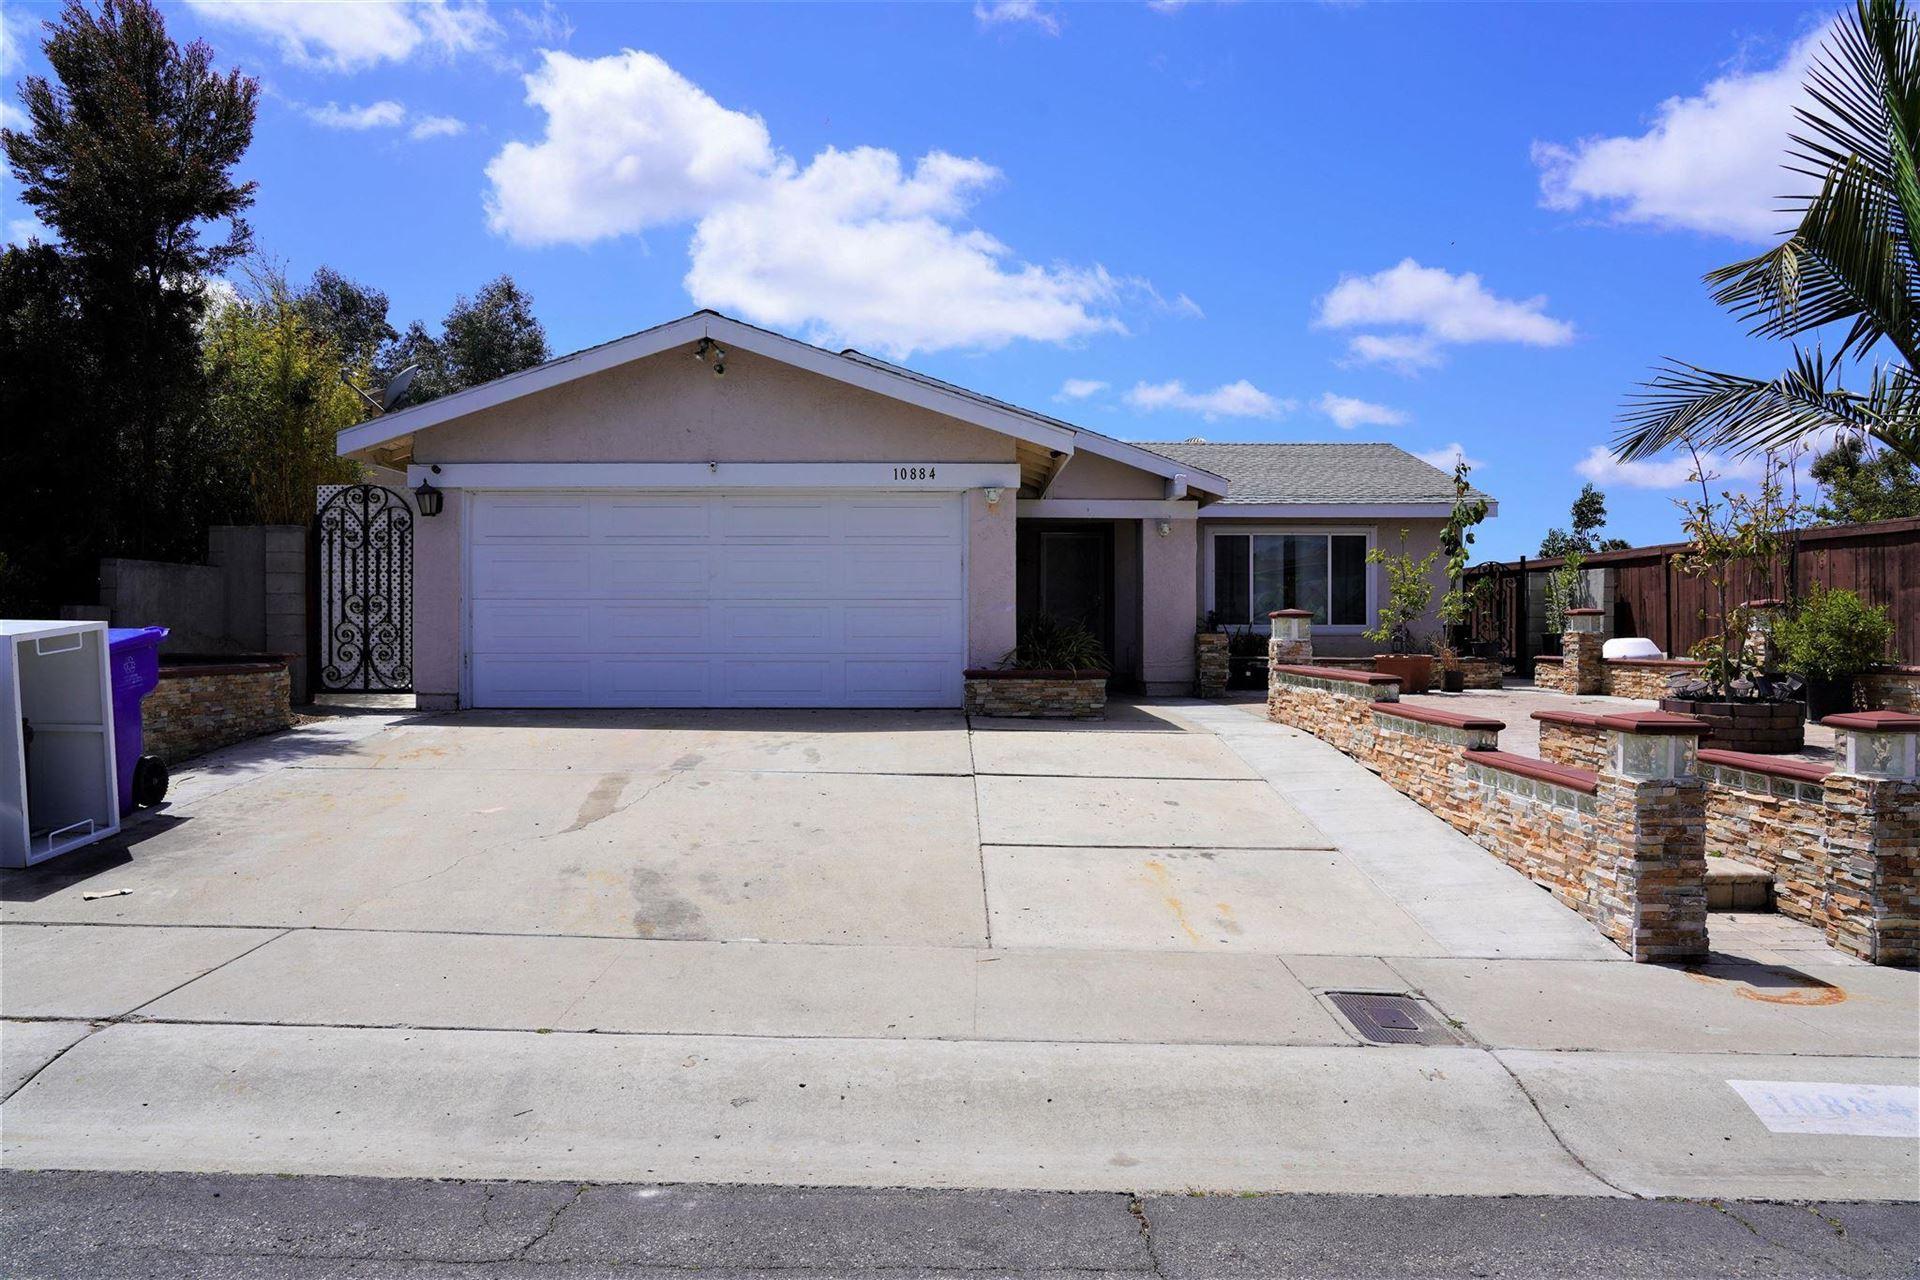 10884 Elderburry Ct, San Diego, CA 92126 - #: 210011043